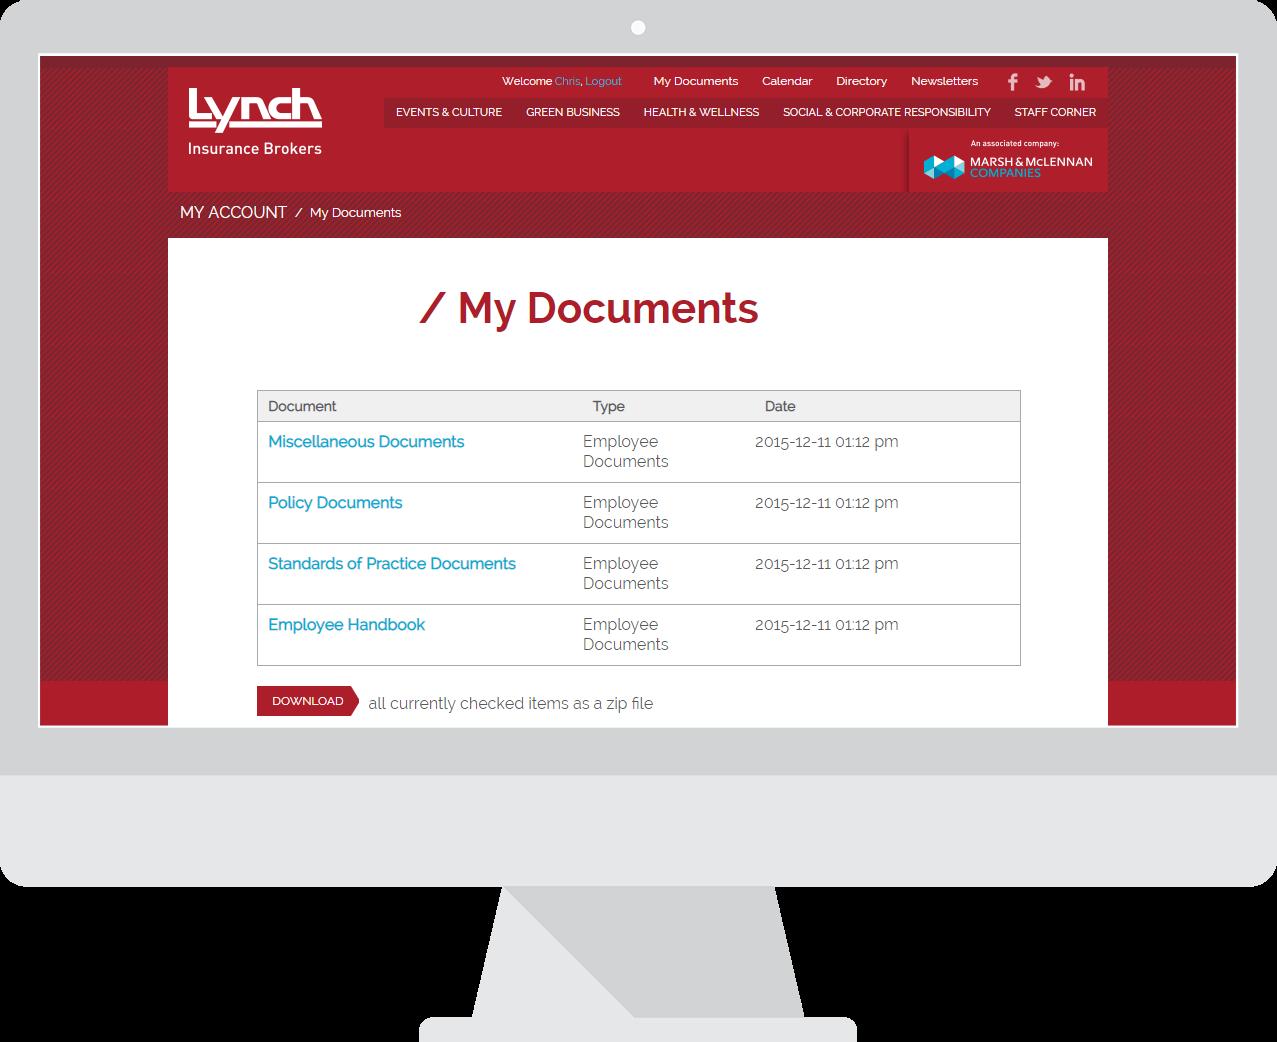 Lynch Insurance brokers - Intranet